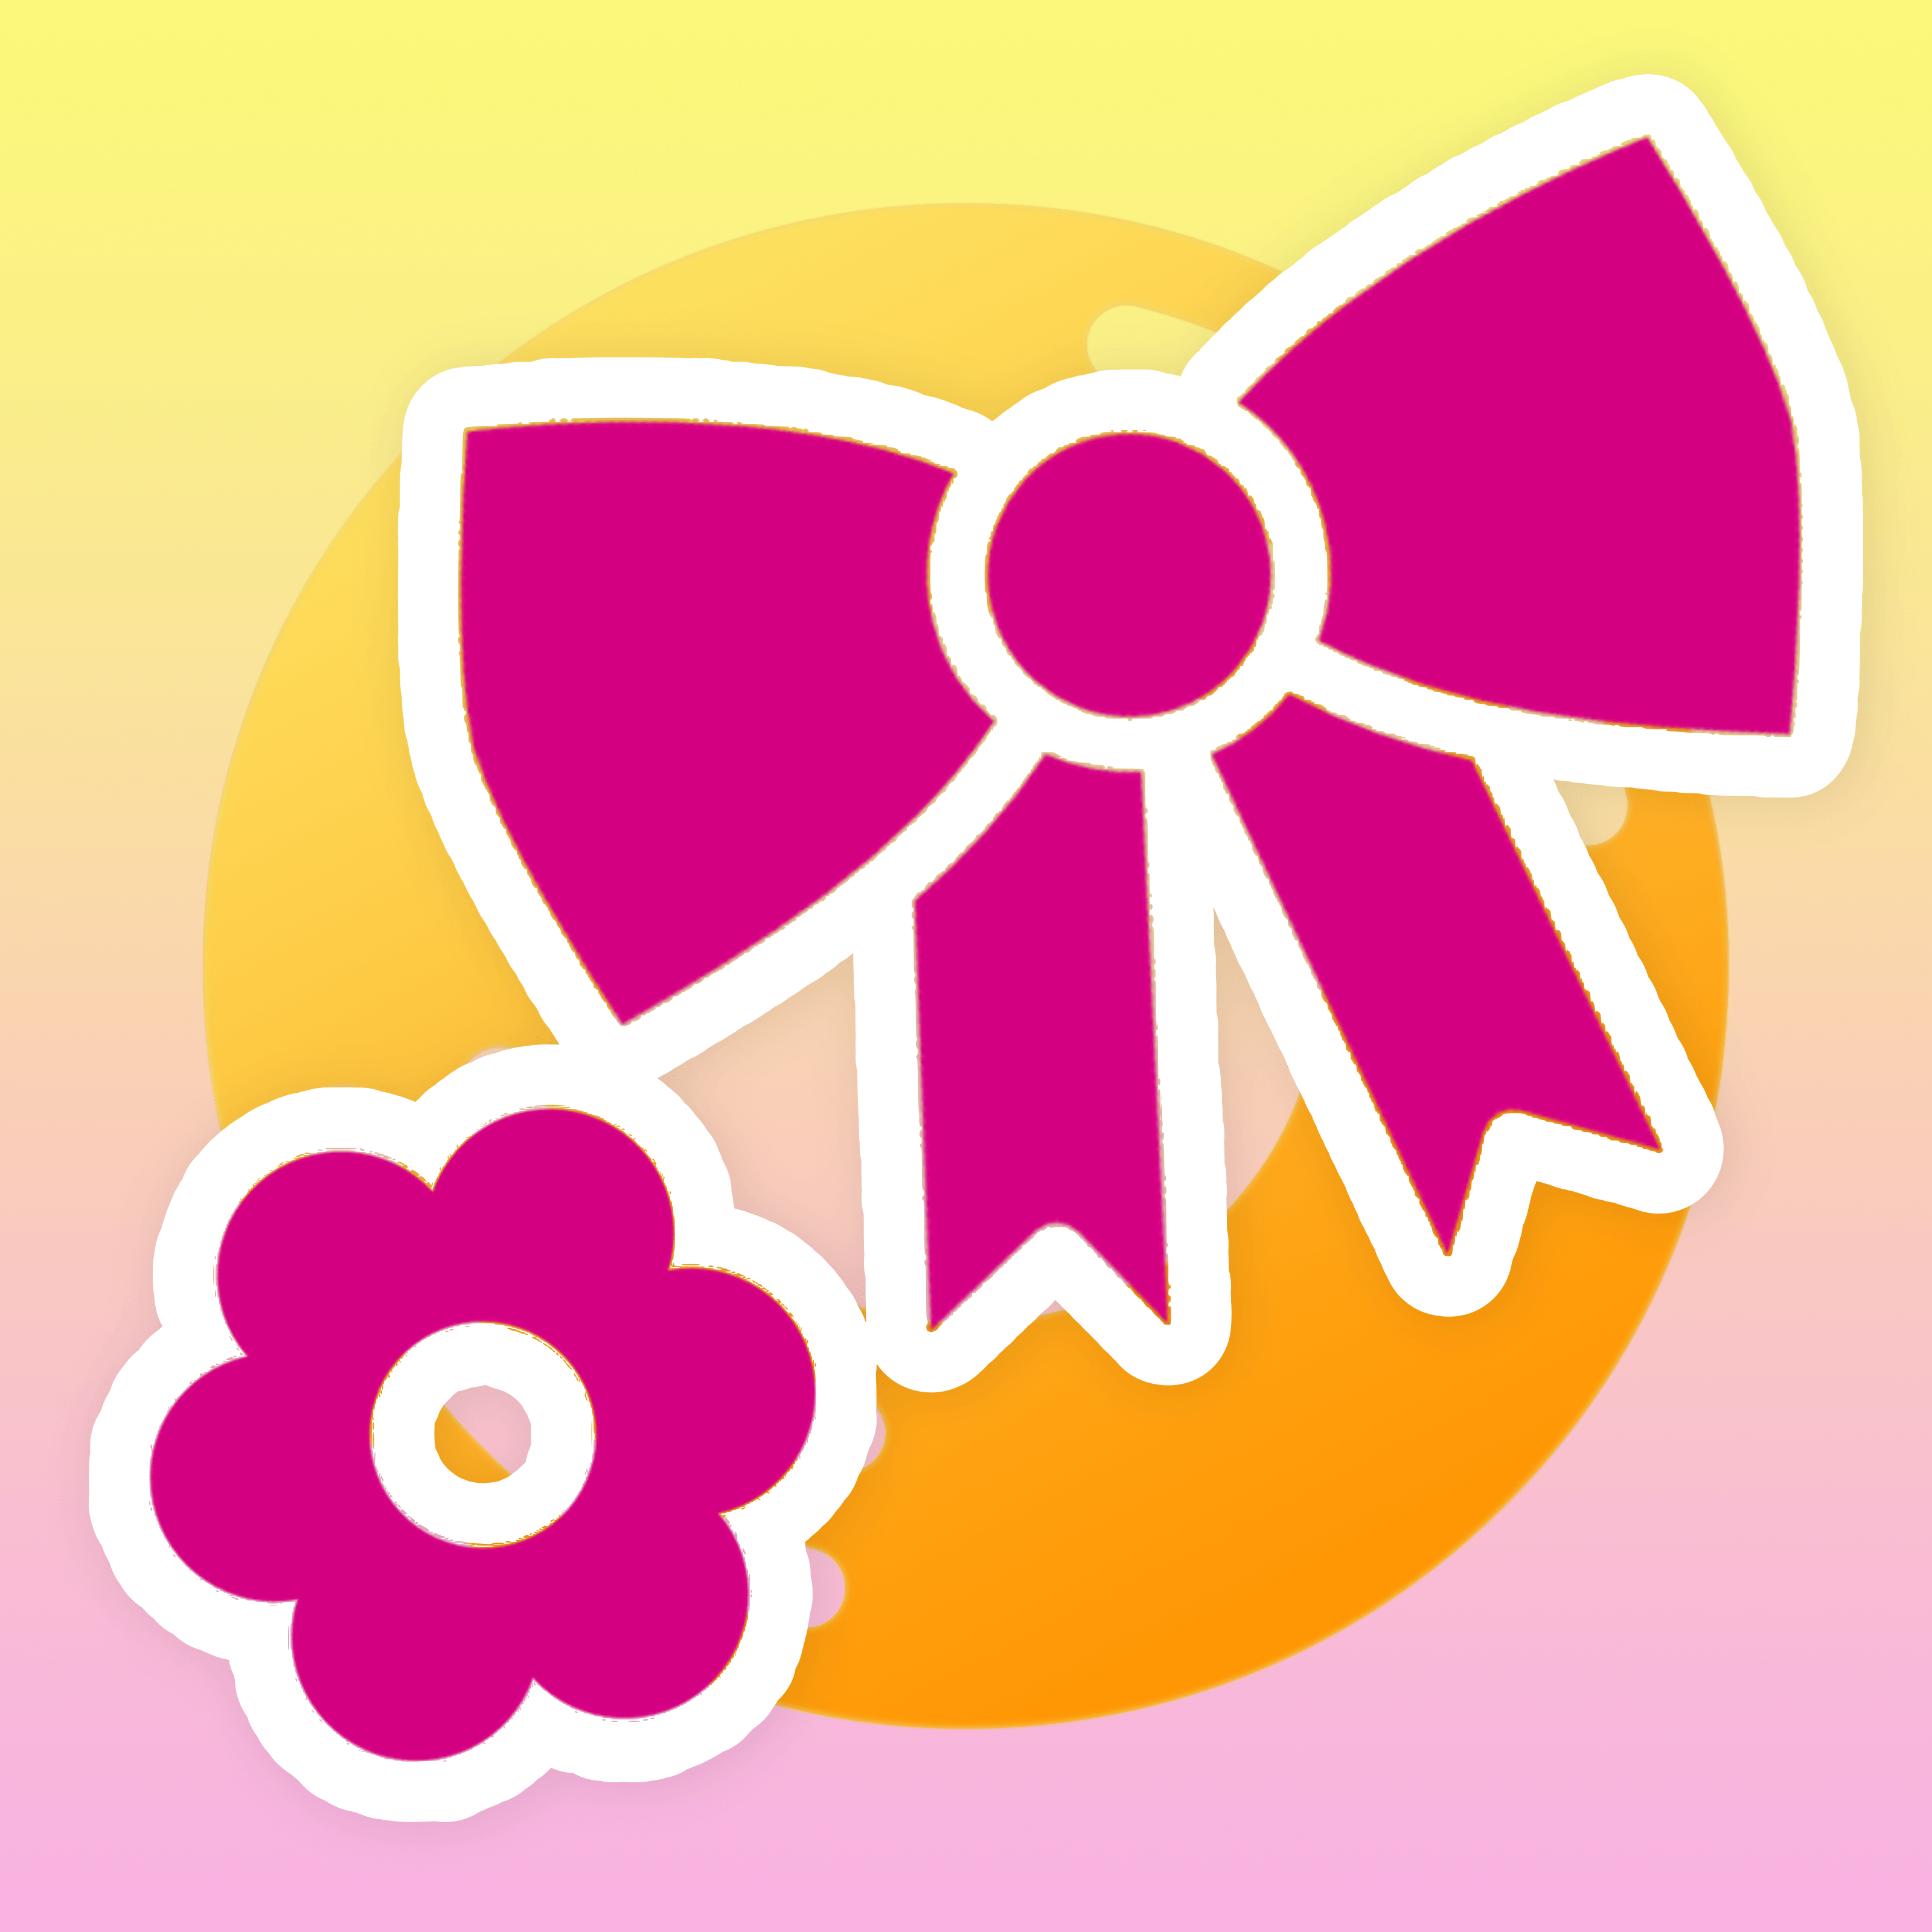 airwing14 avatar